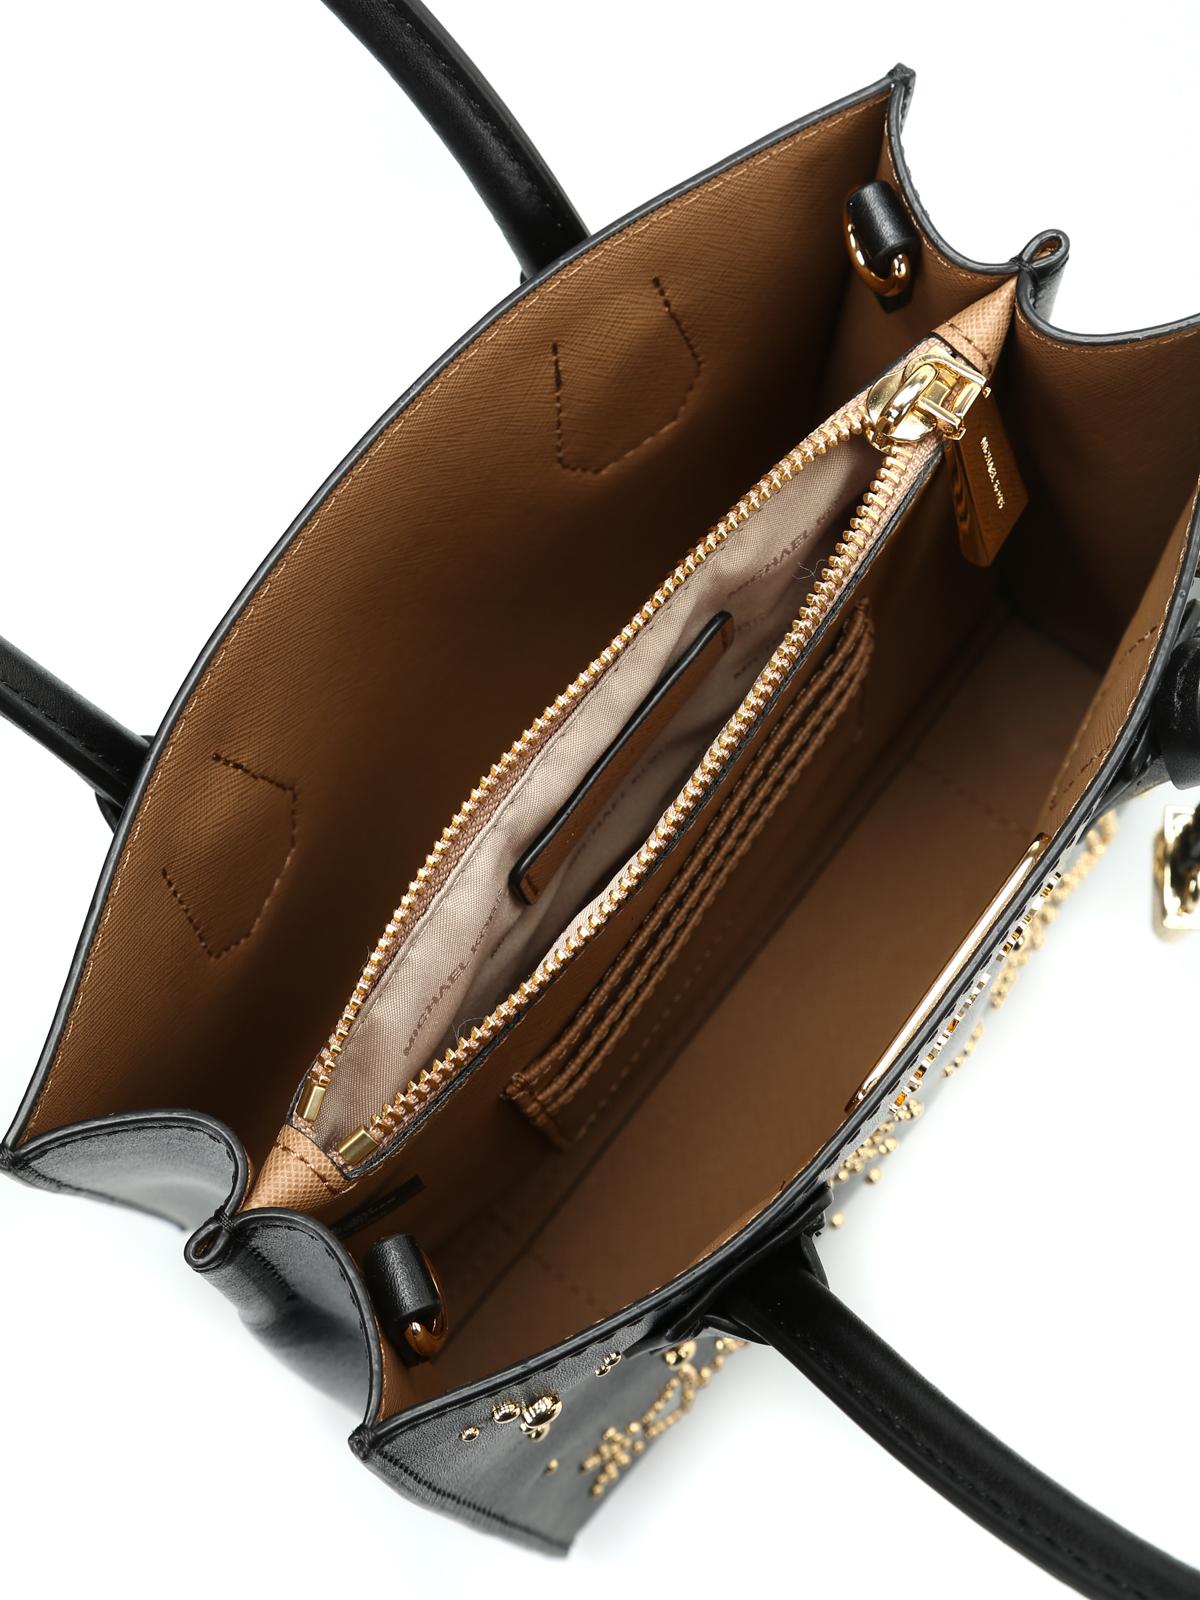 Michael Kors Borsa Mercer M con stelle e borchie borse a